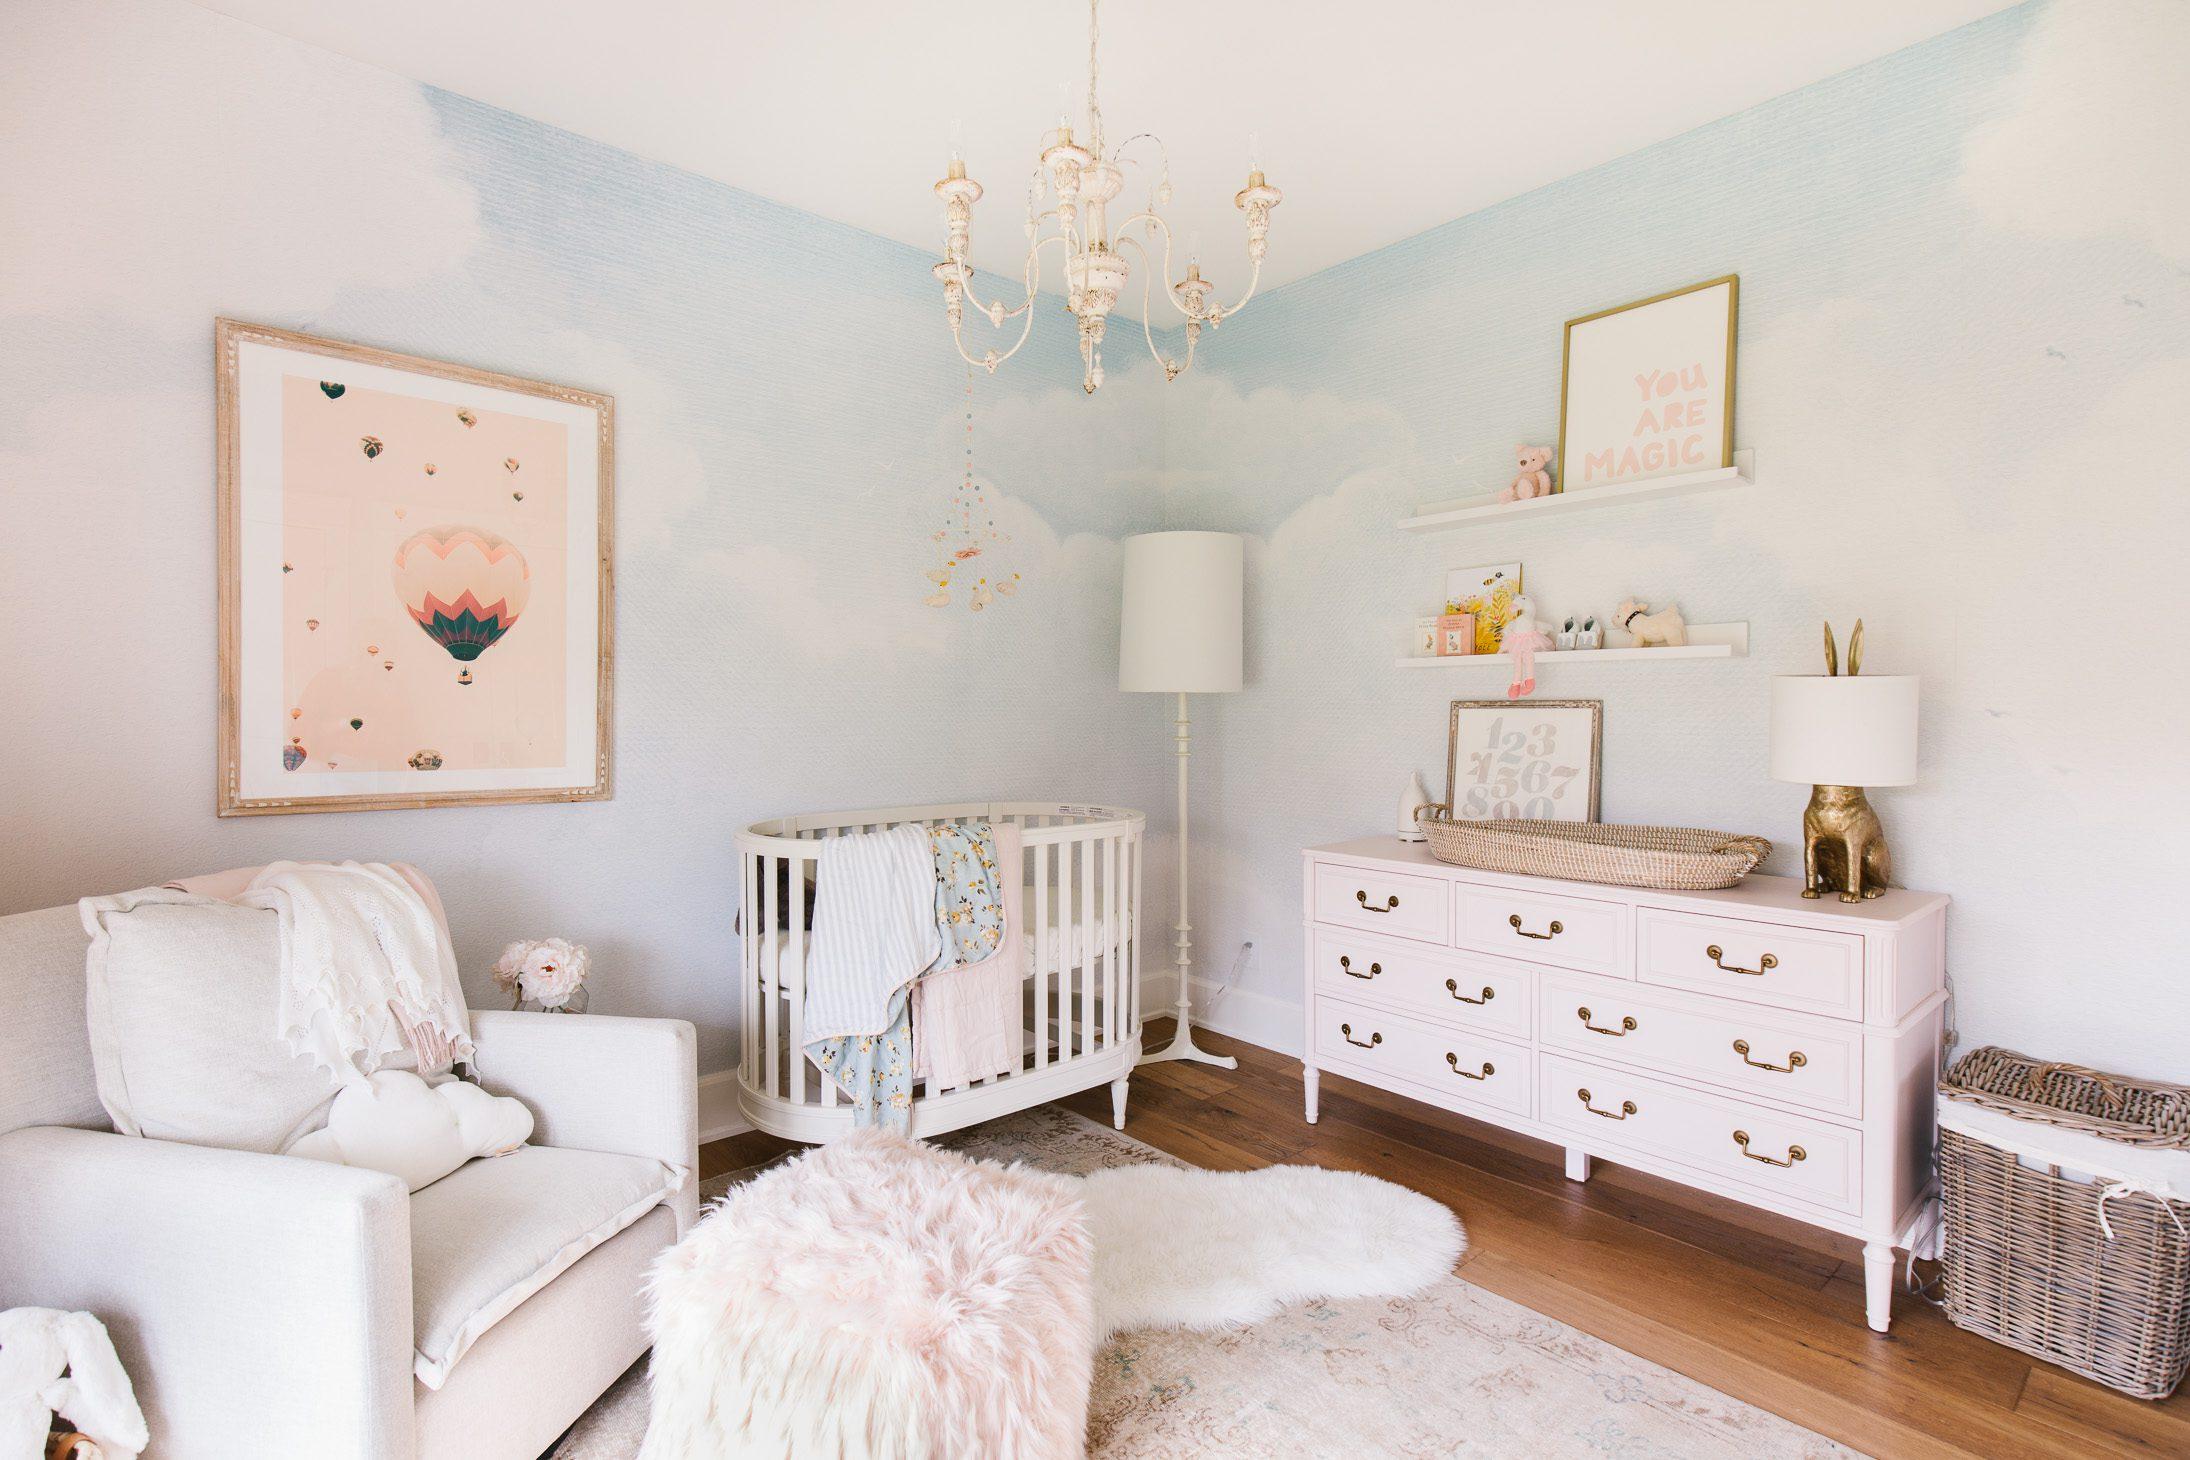 Annie's Nursery